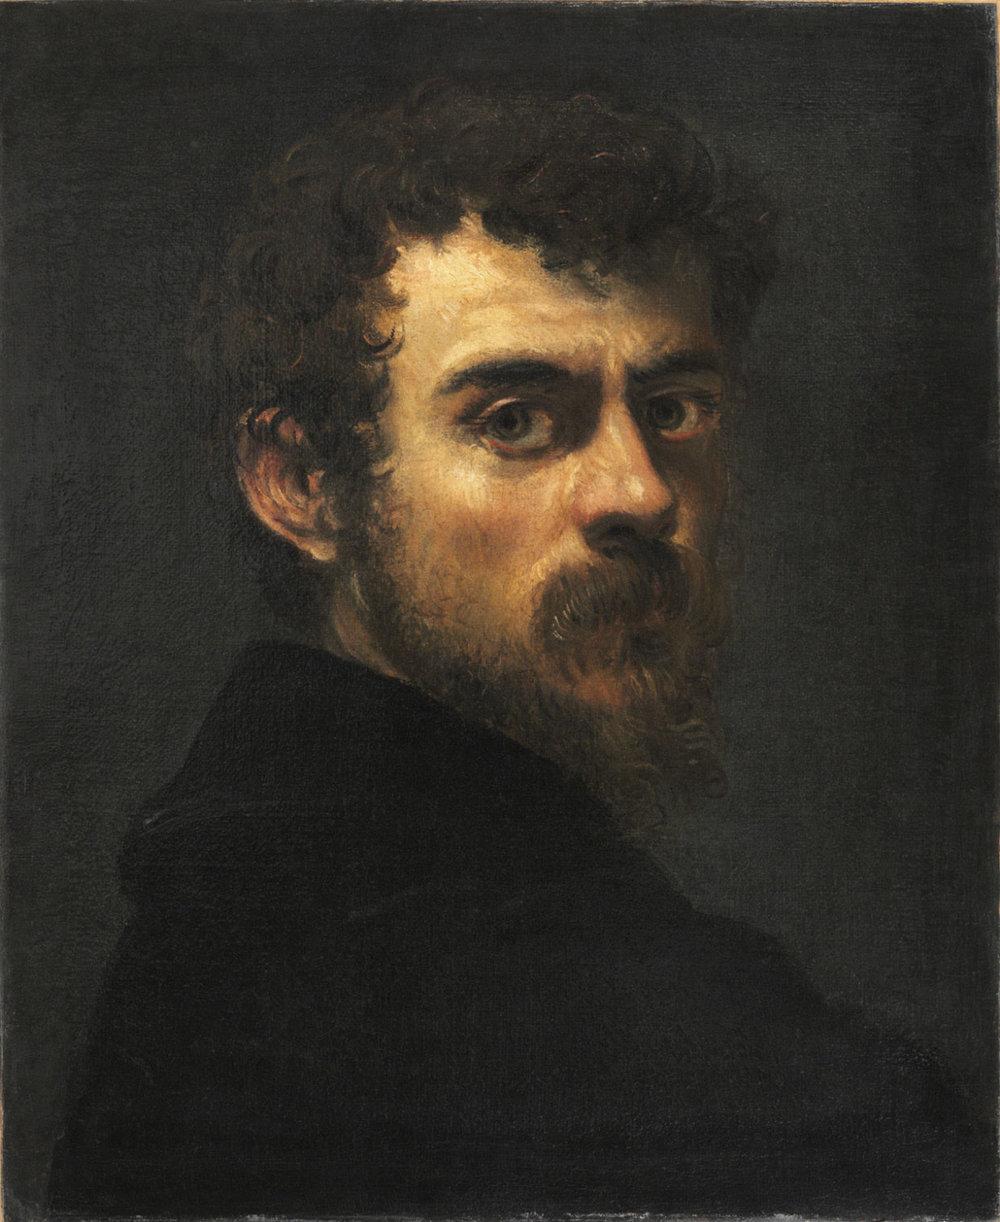 Tintoretto, 'Self-Portrait' c. 1546